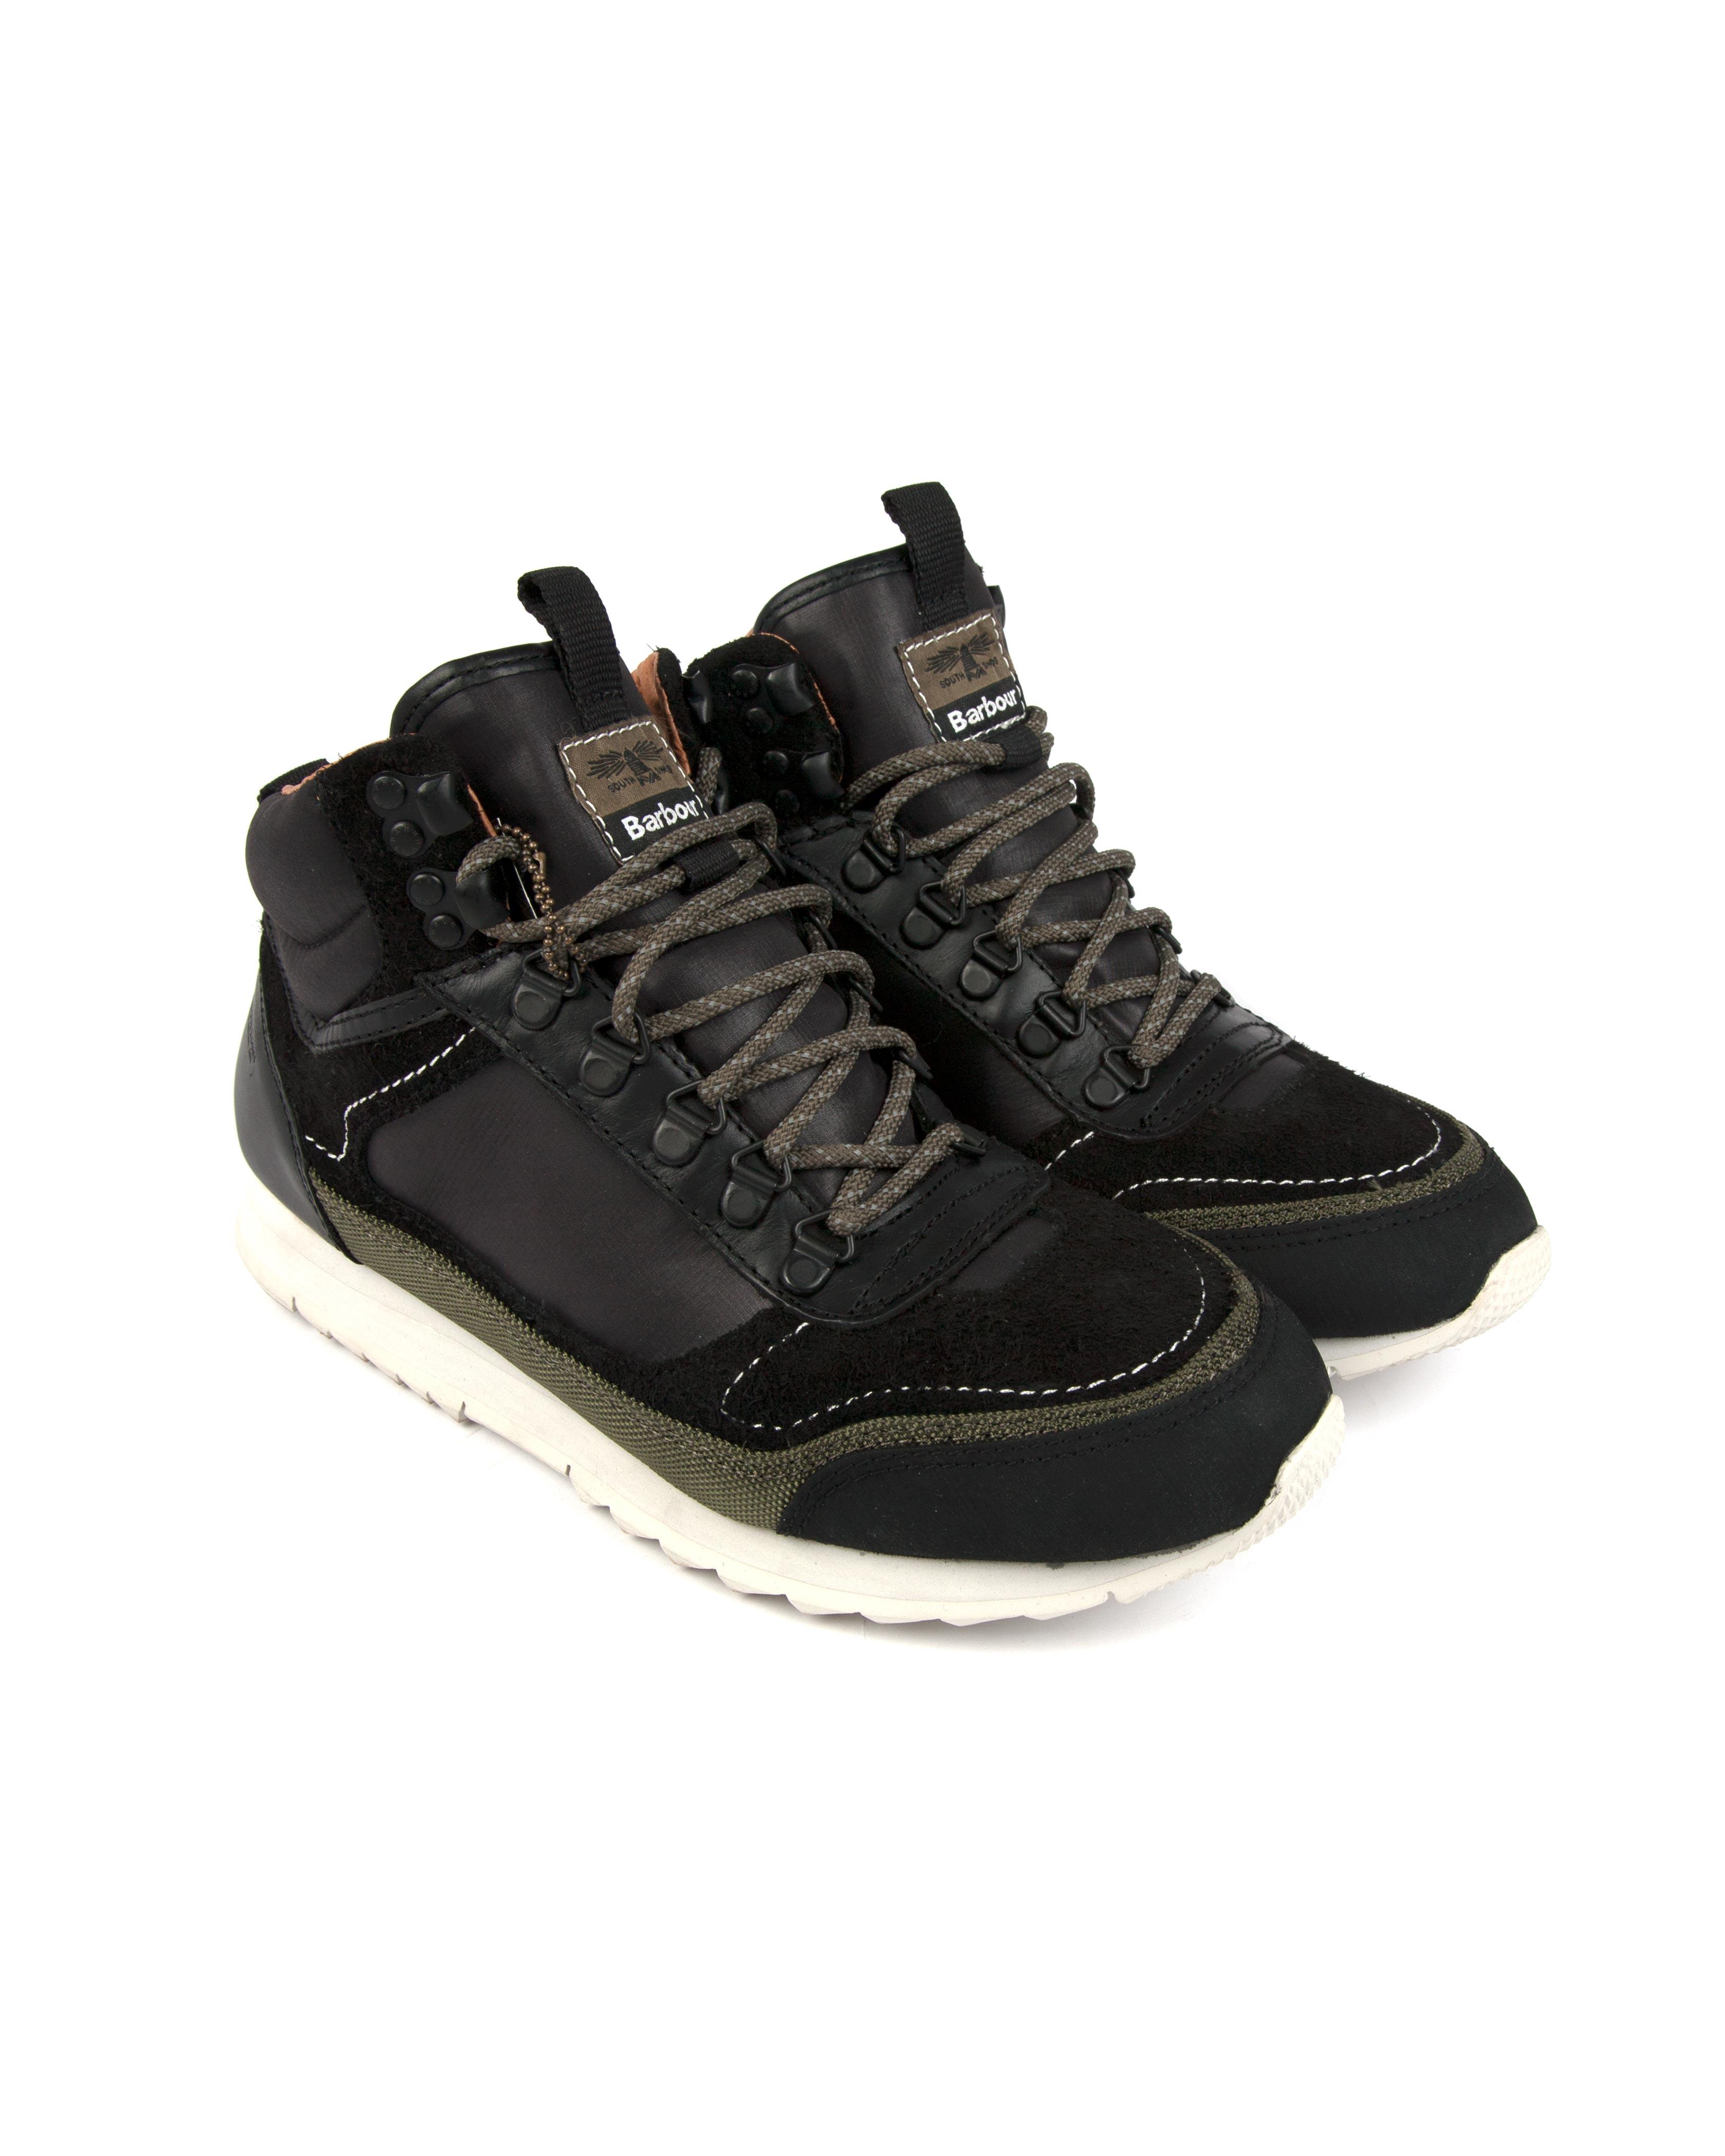 Ботинки Barbour Tech Winter Boots Black